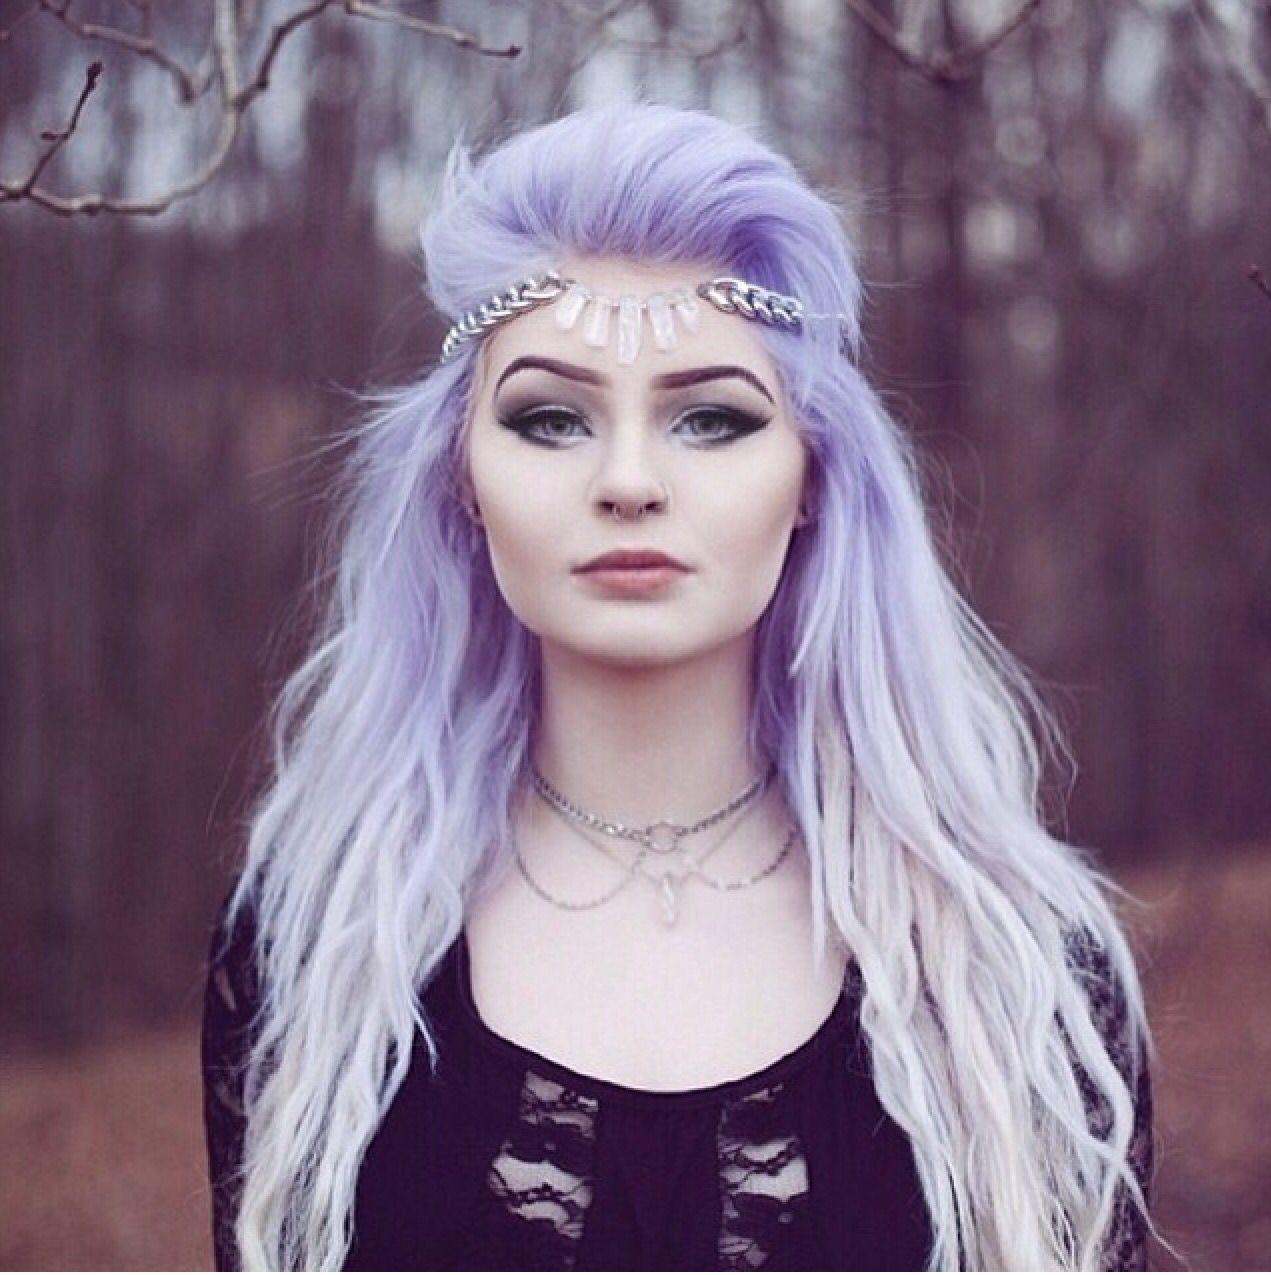 2019 year looks- Girls tumblr with light purple hair